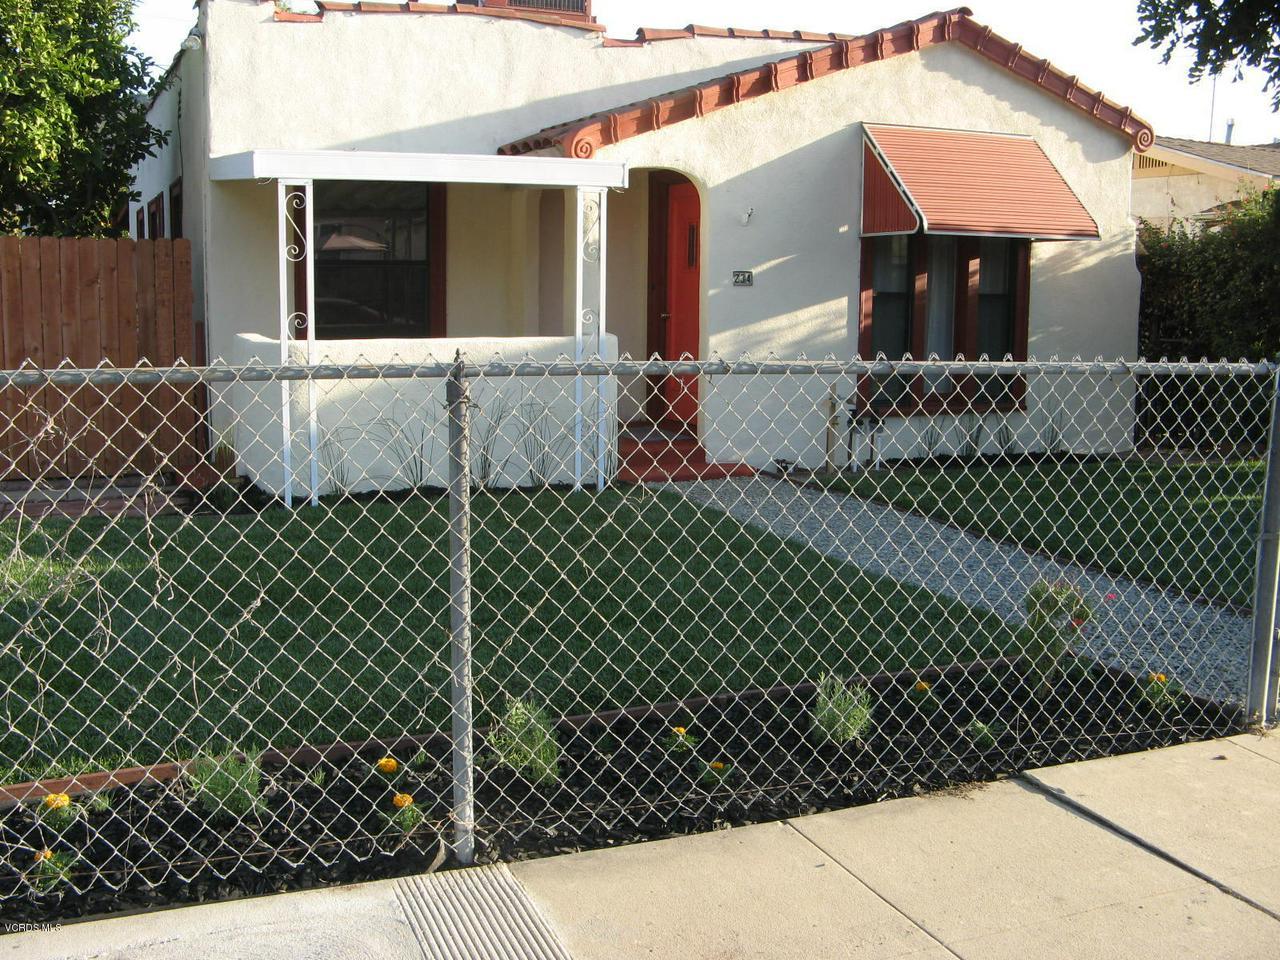 234 CHESTNUT, Los Angeles (City), CA 90042 - 234 Chestnut Ave 11 9 18 011